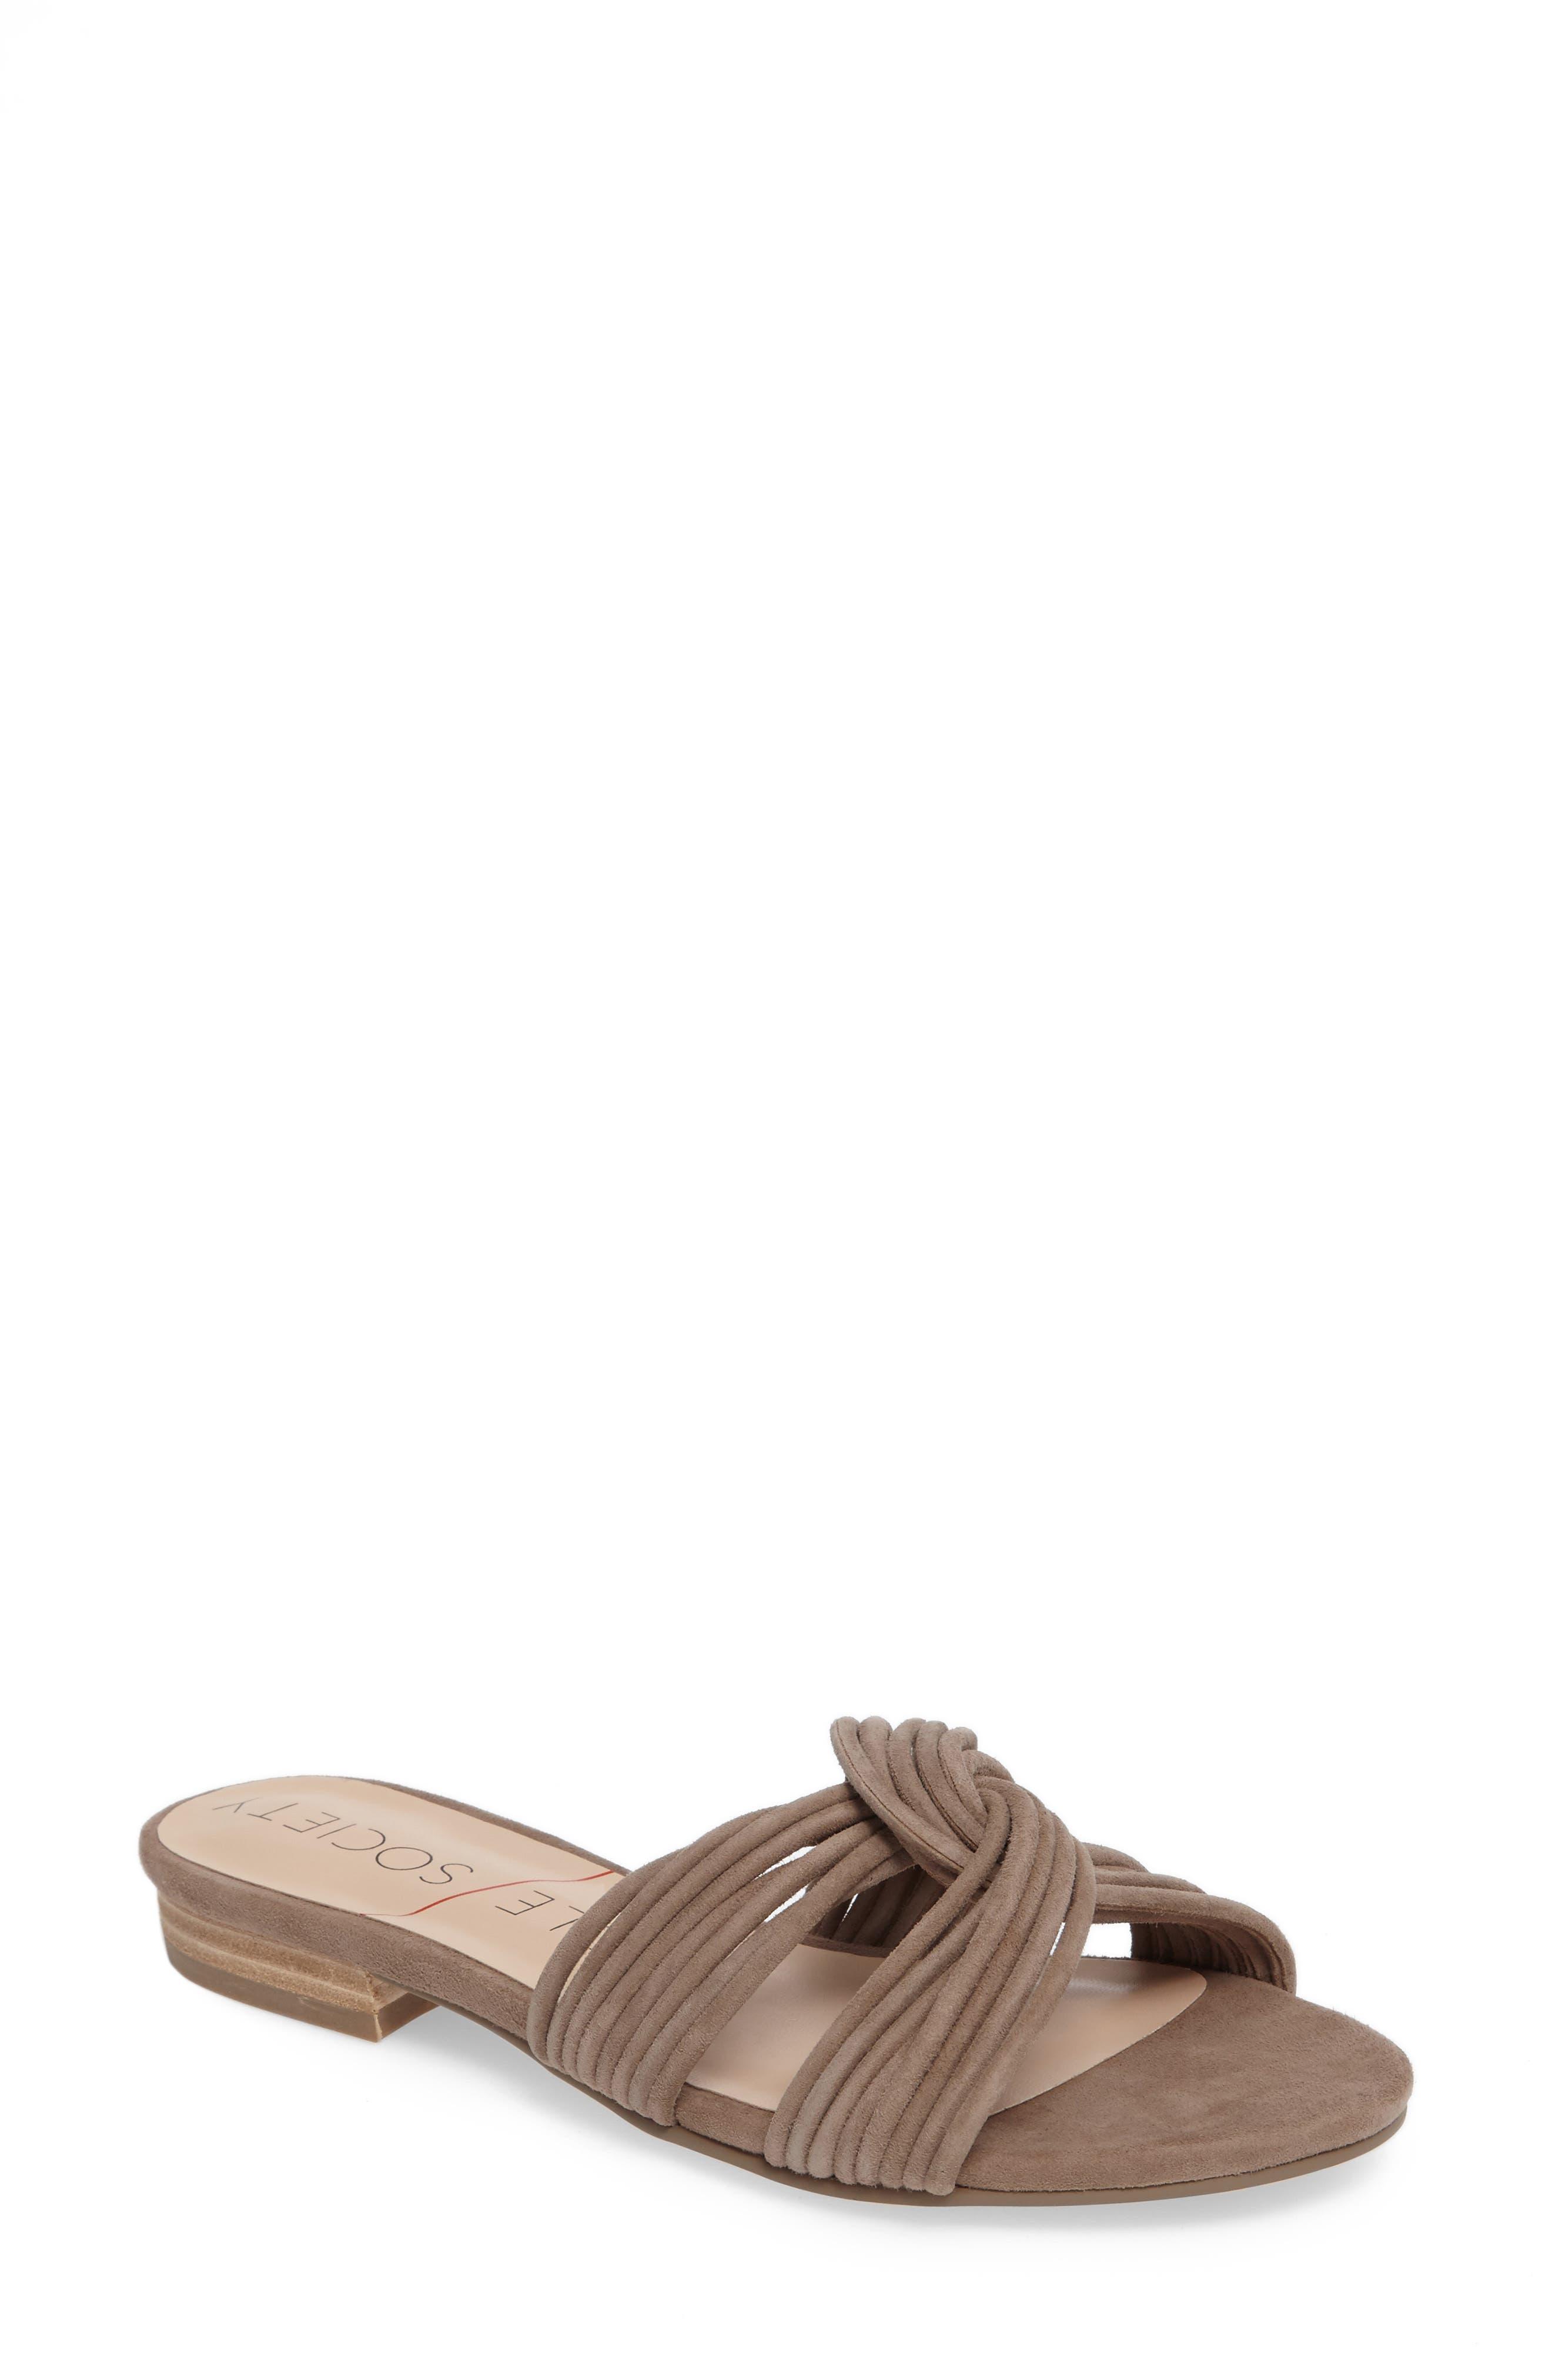 SOLE SOCIETY, Dahlia Flat Sandal, Main thumbnail 1, color, 240